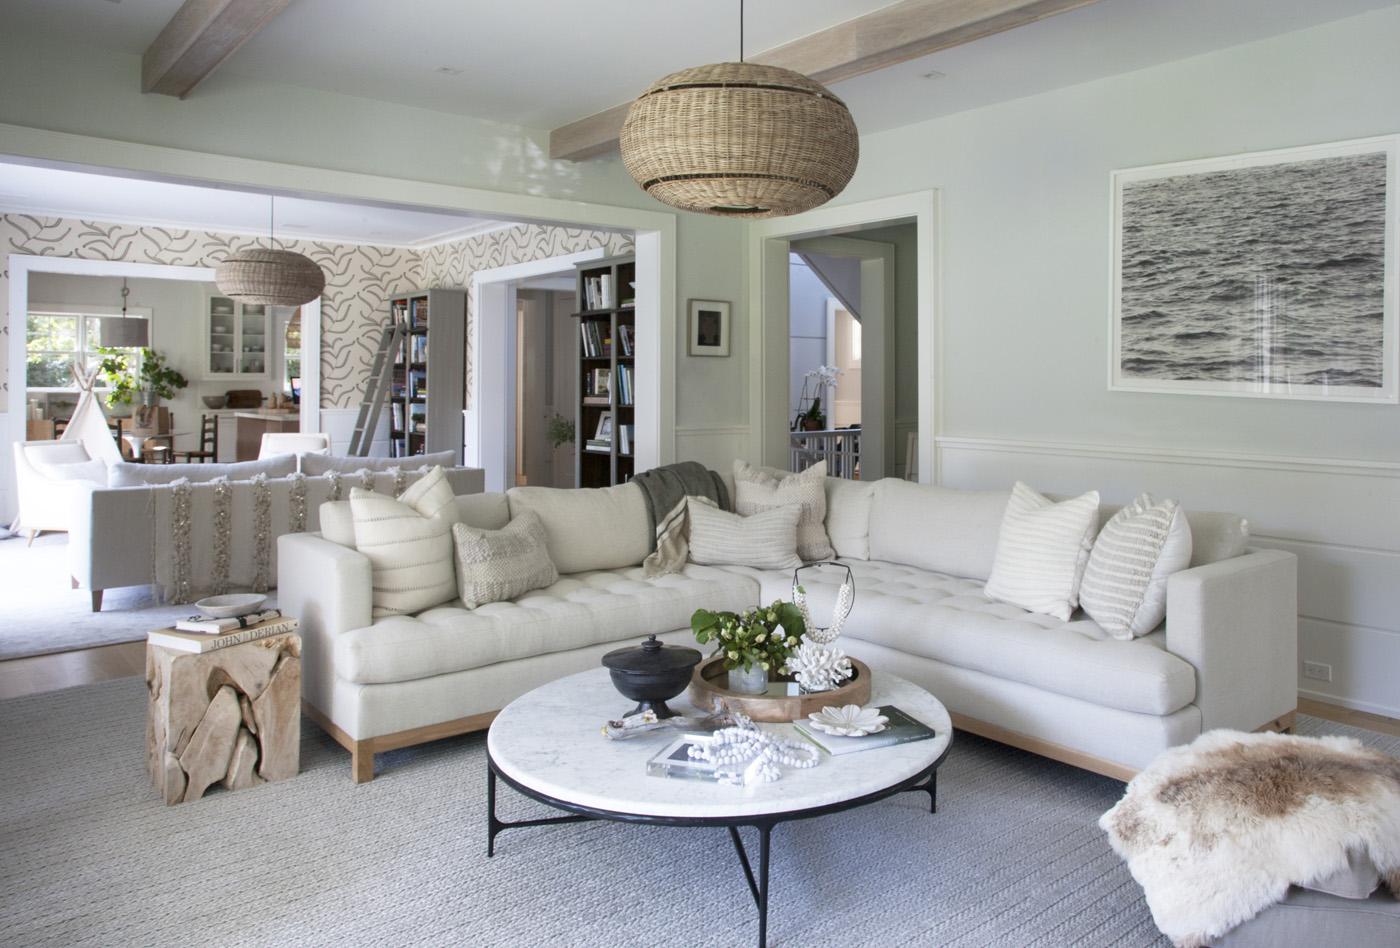 Farrin_Cary_Design_Interior_Hamptons_0251.jpg